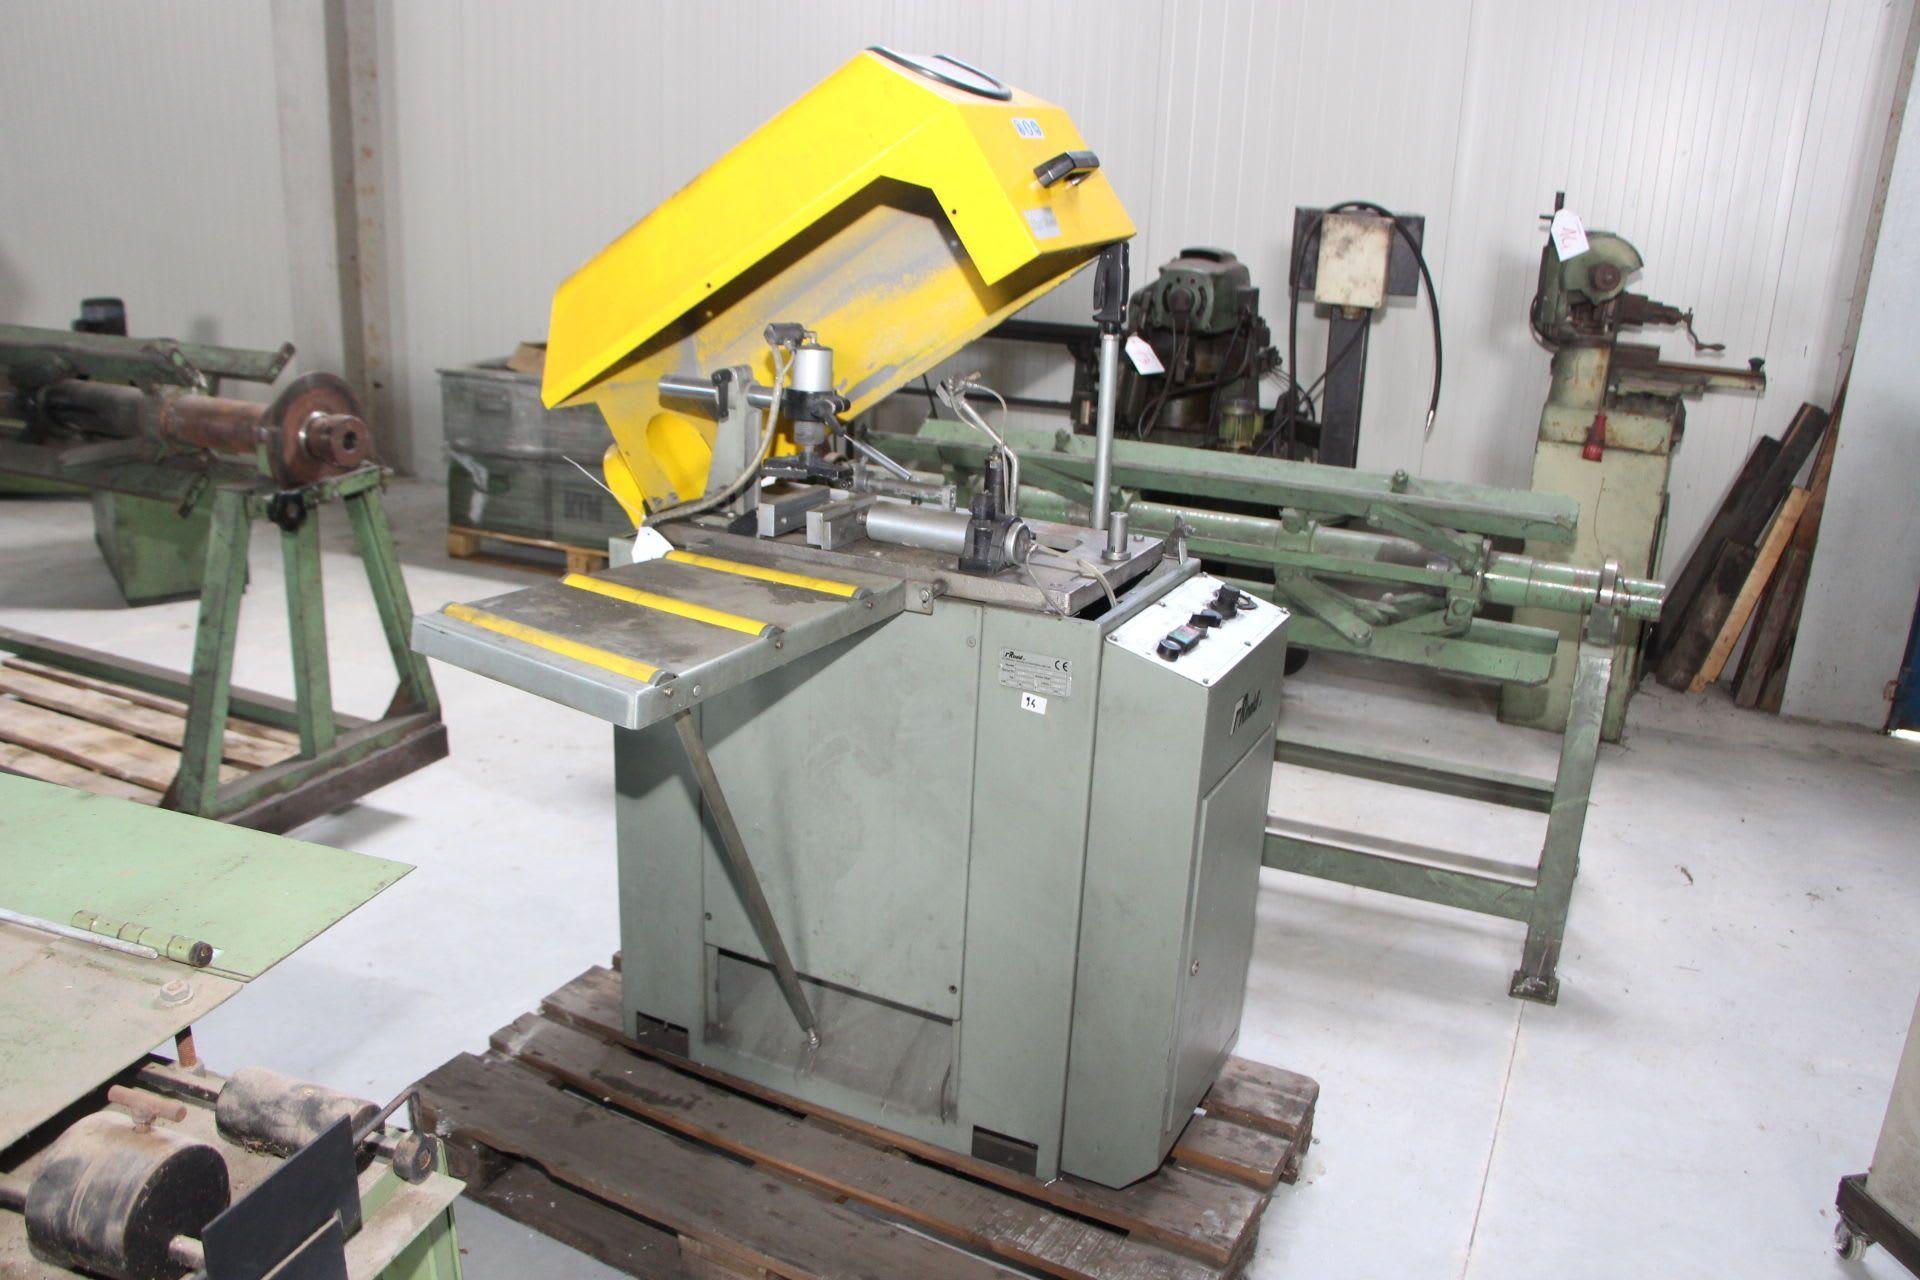 RINALDI LILLYPUT 9M - 7000 Fräsmaschine